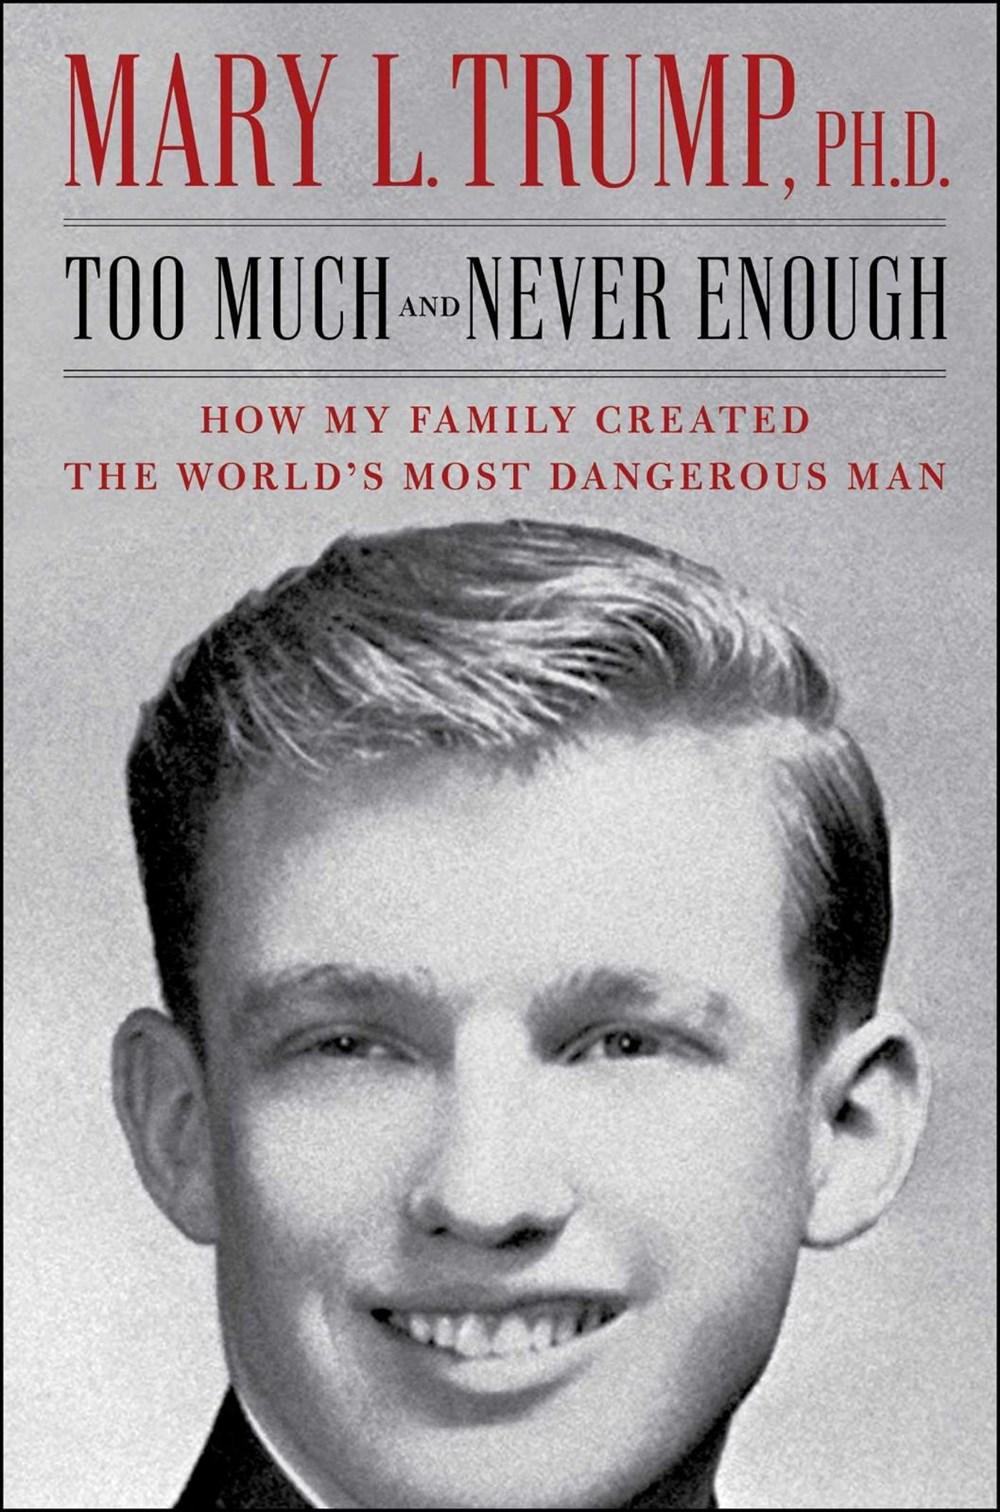 Donald Trump'ı zora sokacak kitaba onay (Too Much and Never Enough) - 6